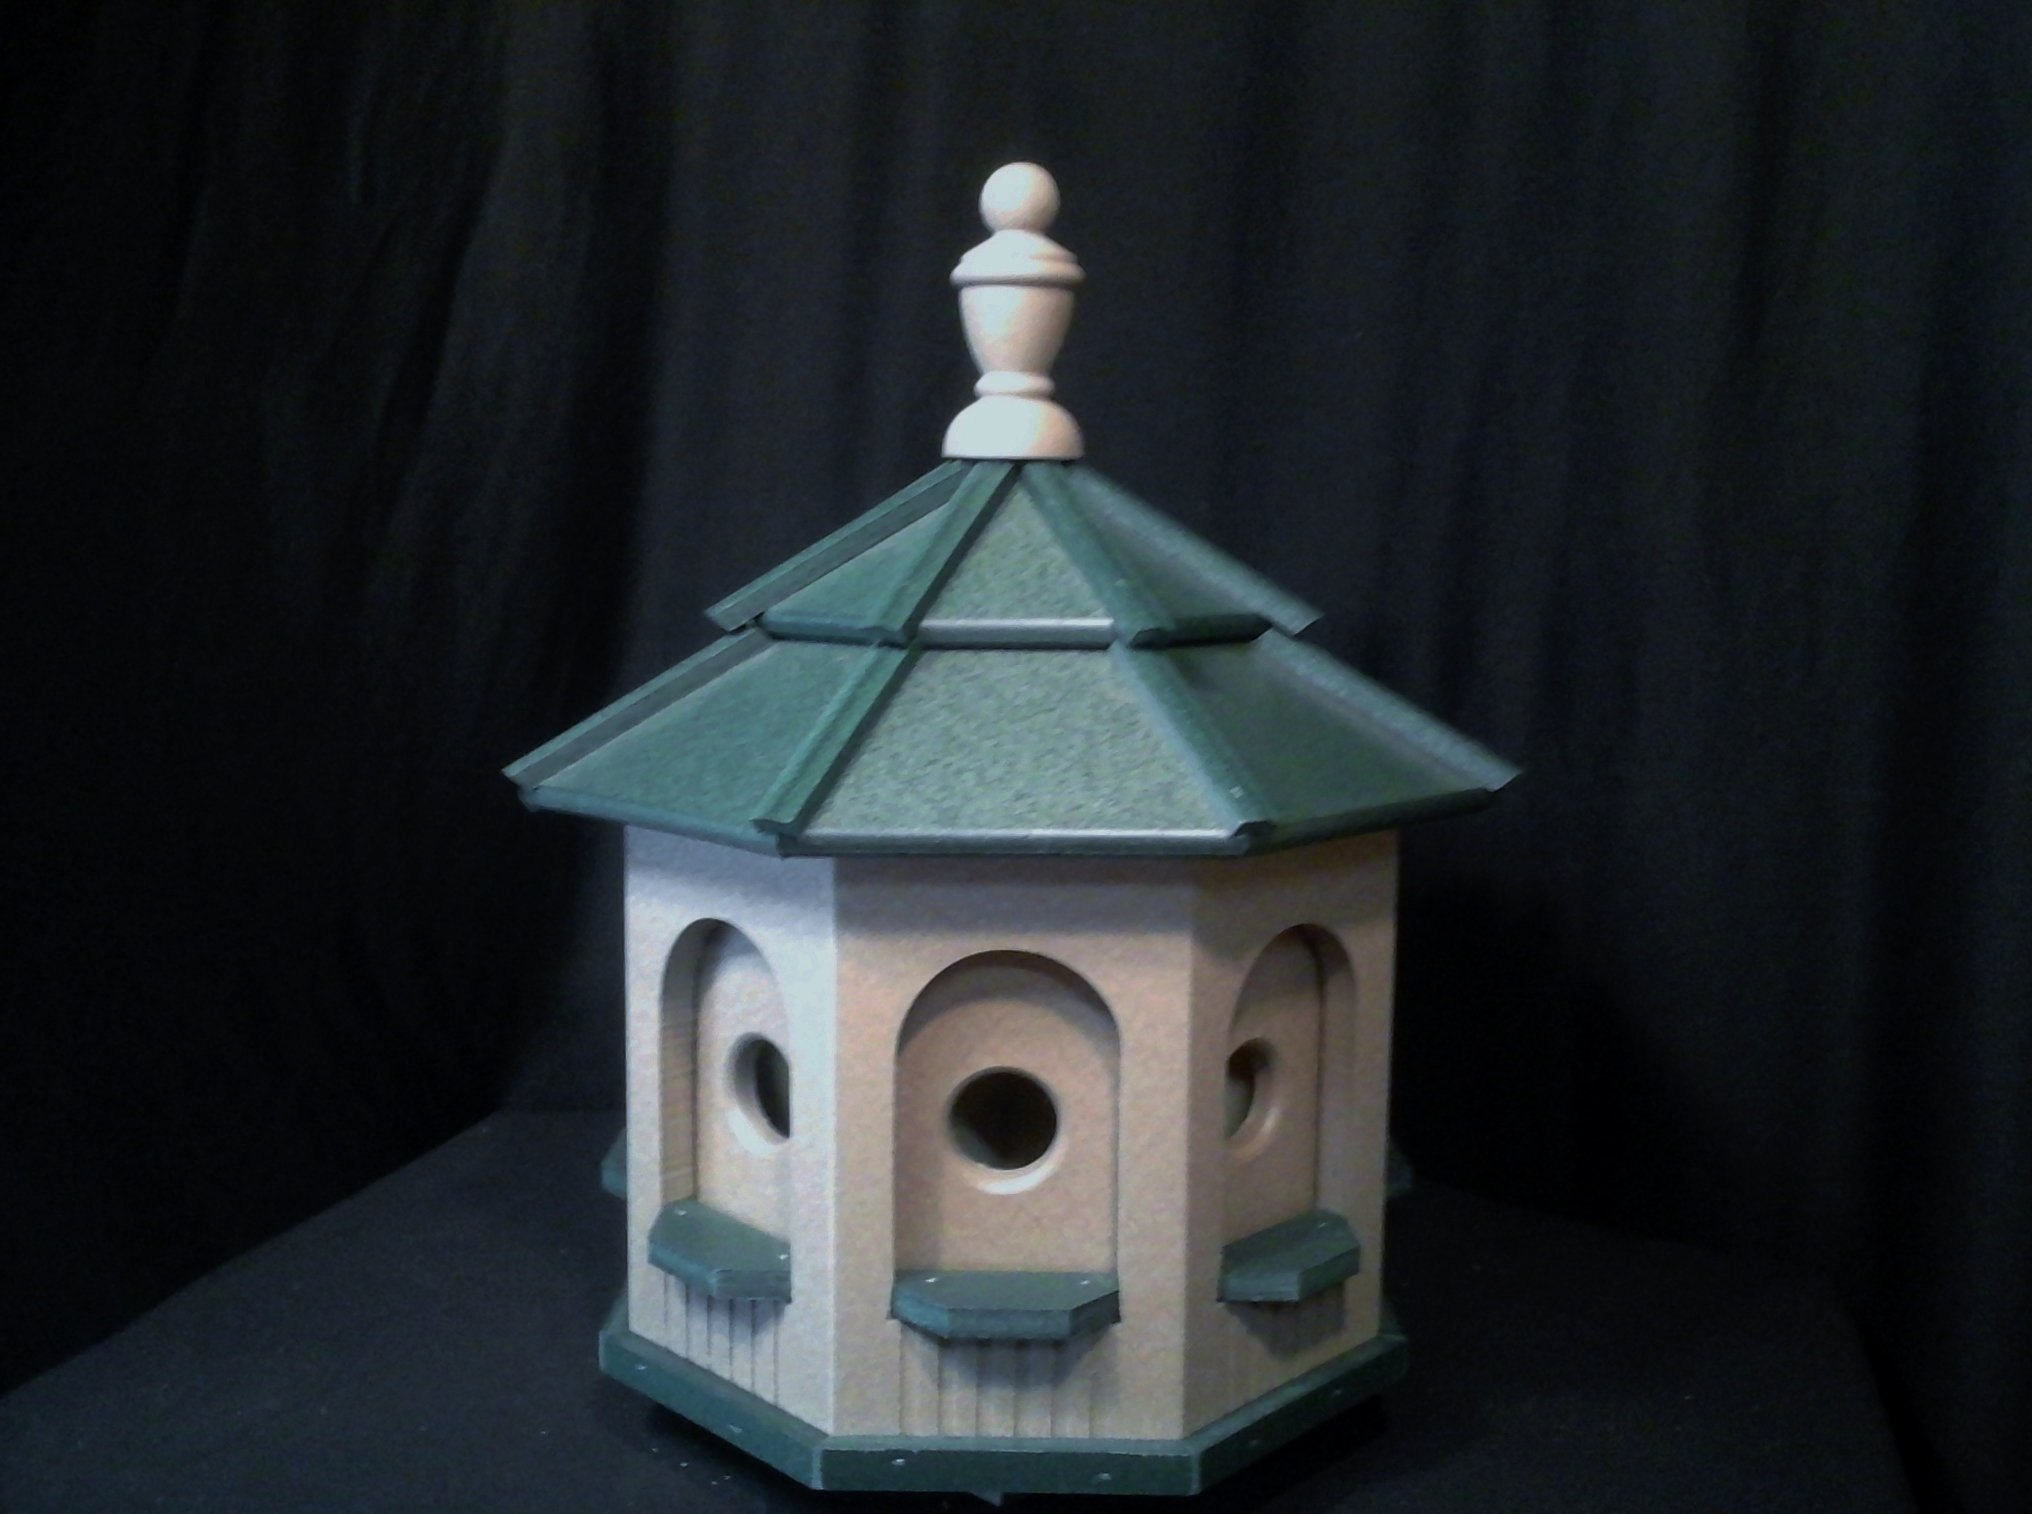 Medium Vinyl Octagon Birdhouse Amish Homemade Handmade Handcrafted Clay & Green